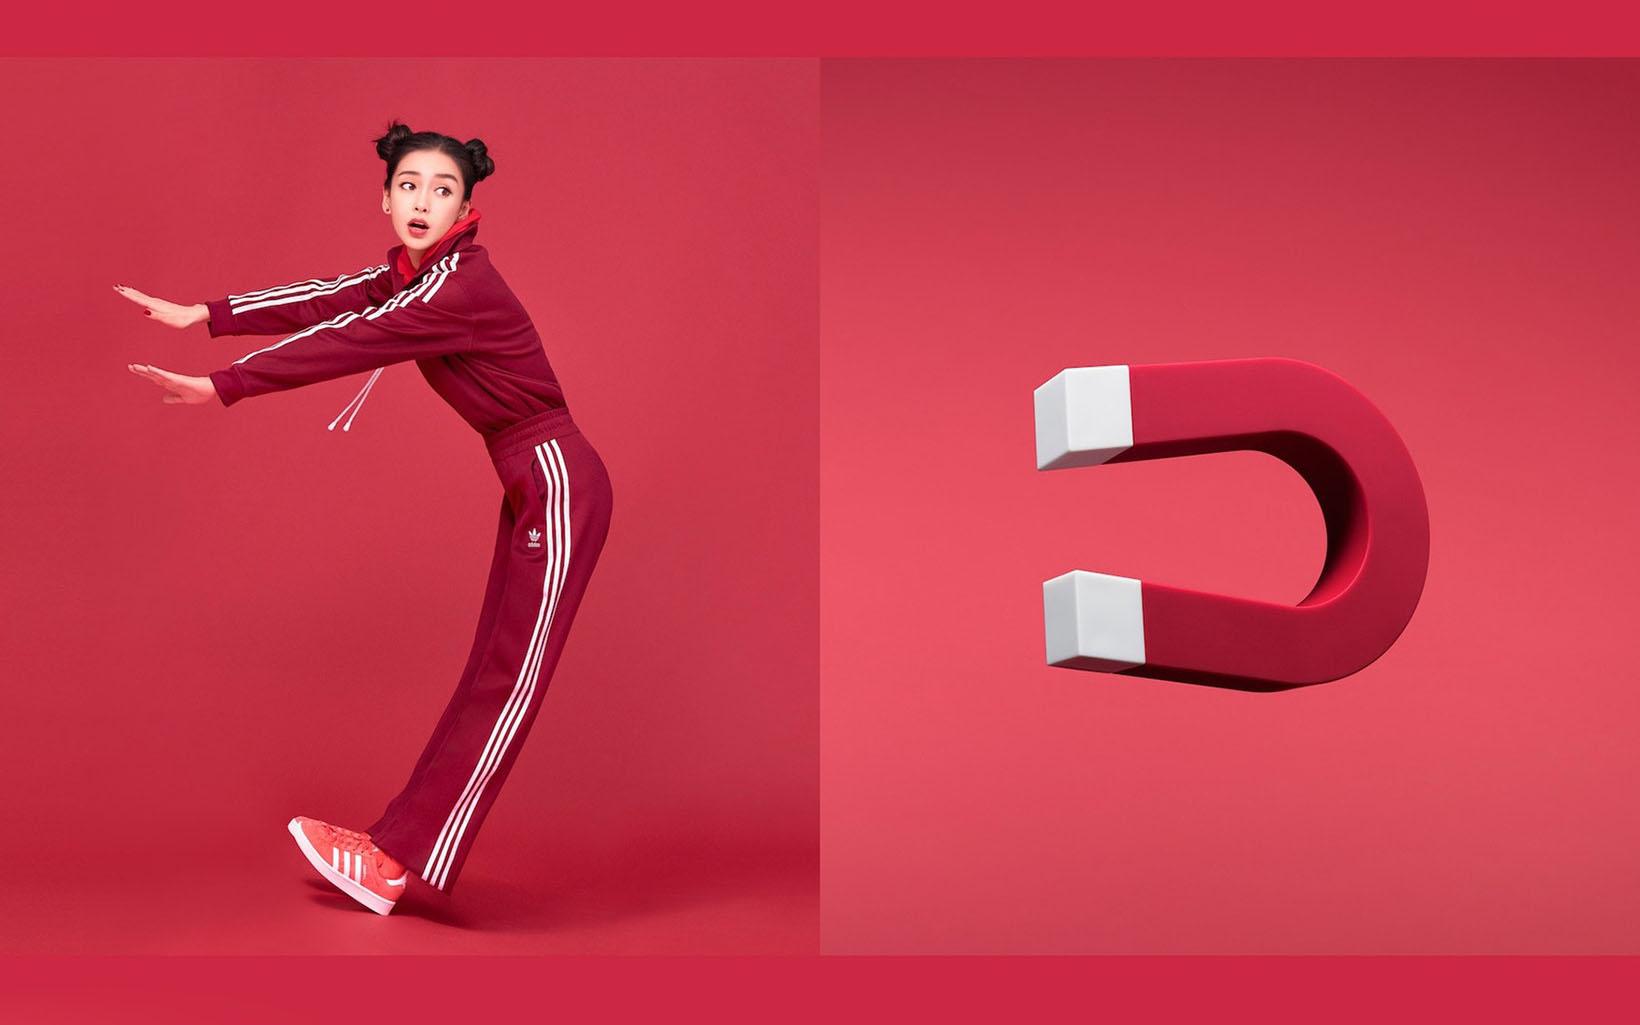 adidas-spring-summer-2018-adicolor-series-collection-4